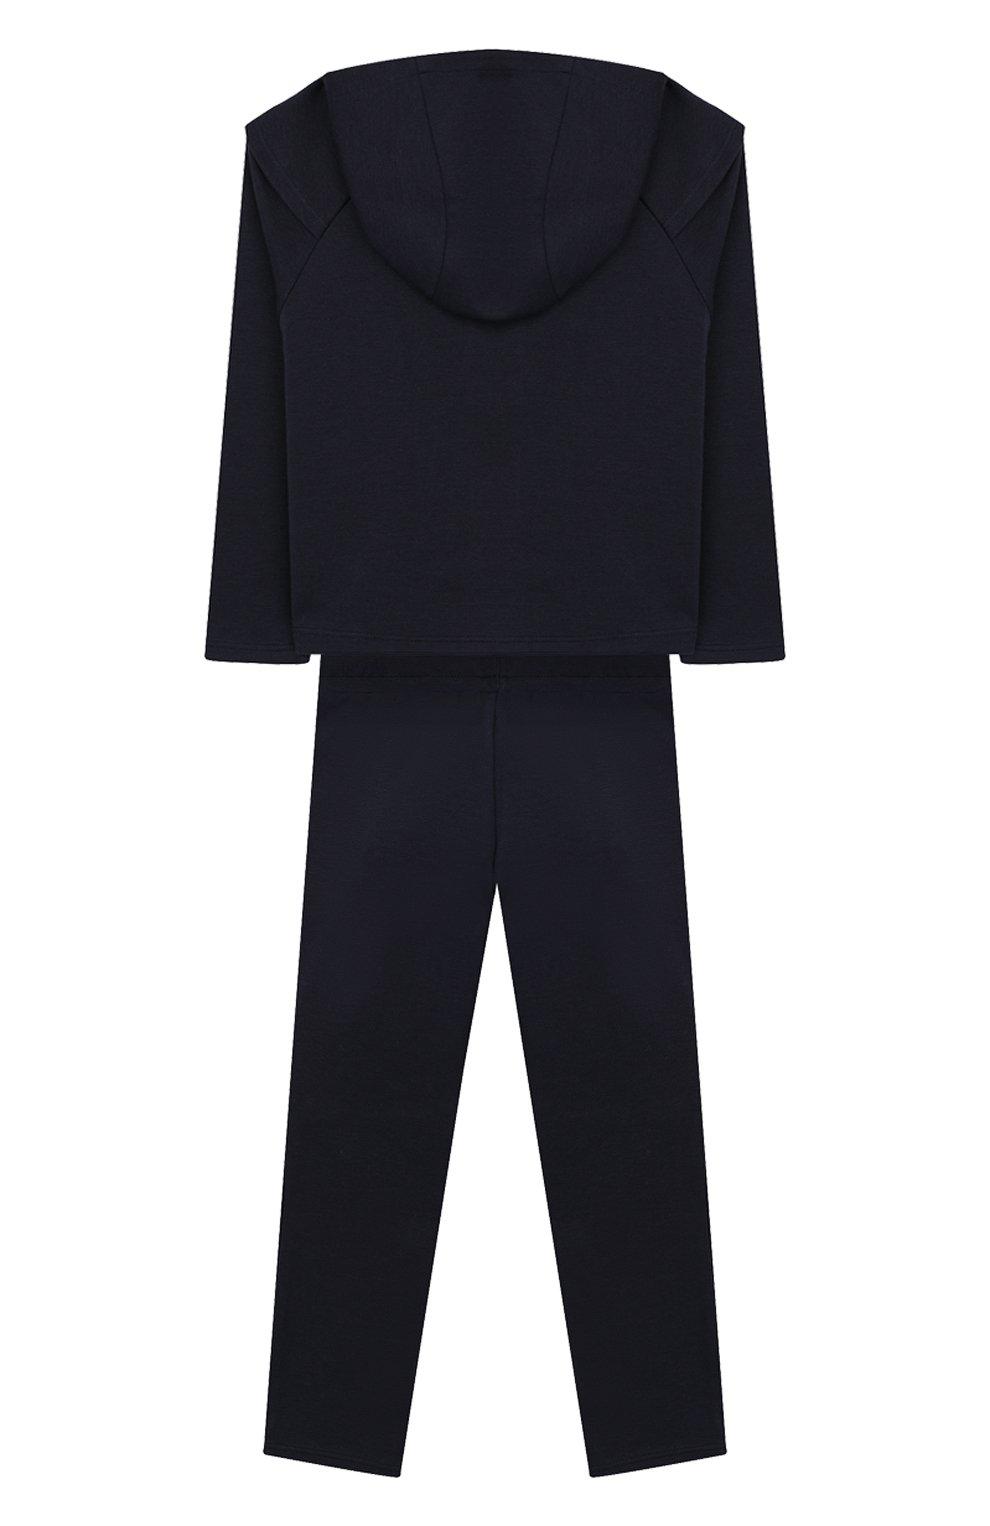 Детский комплект из кардигана и брюк MARC JACOBS (THE) синего цвета, арт. W08066   Фото 2